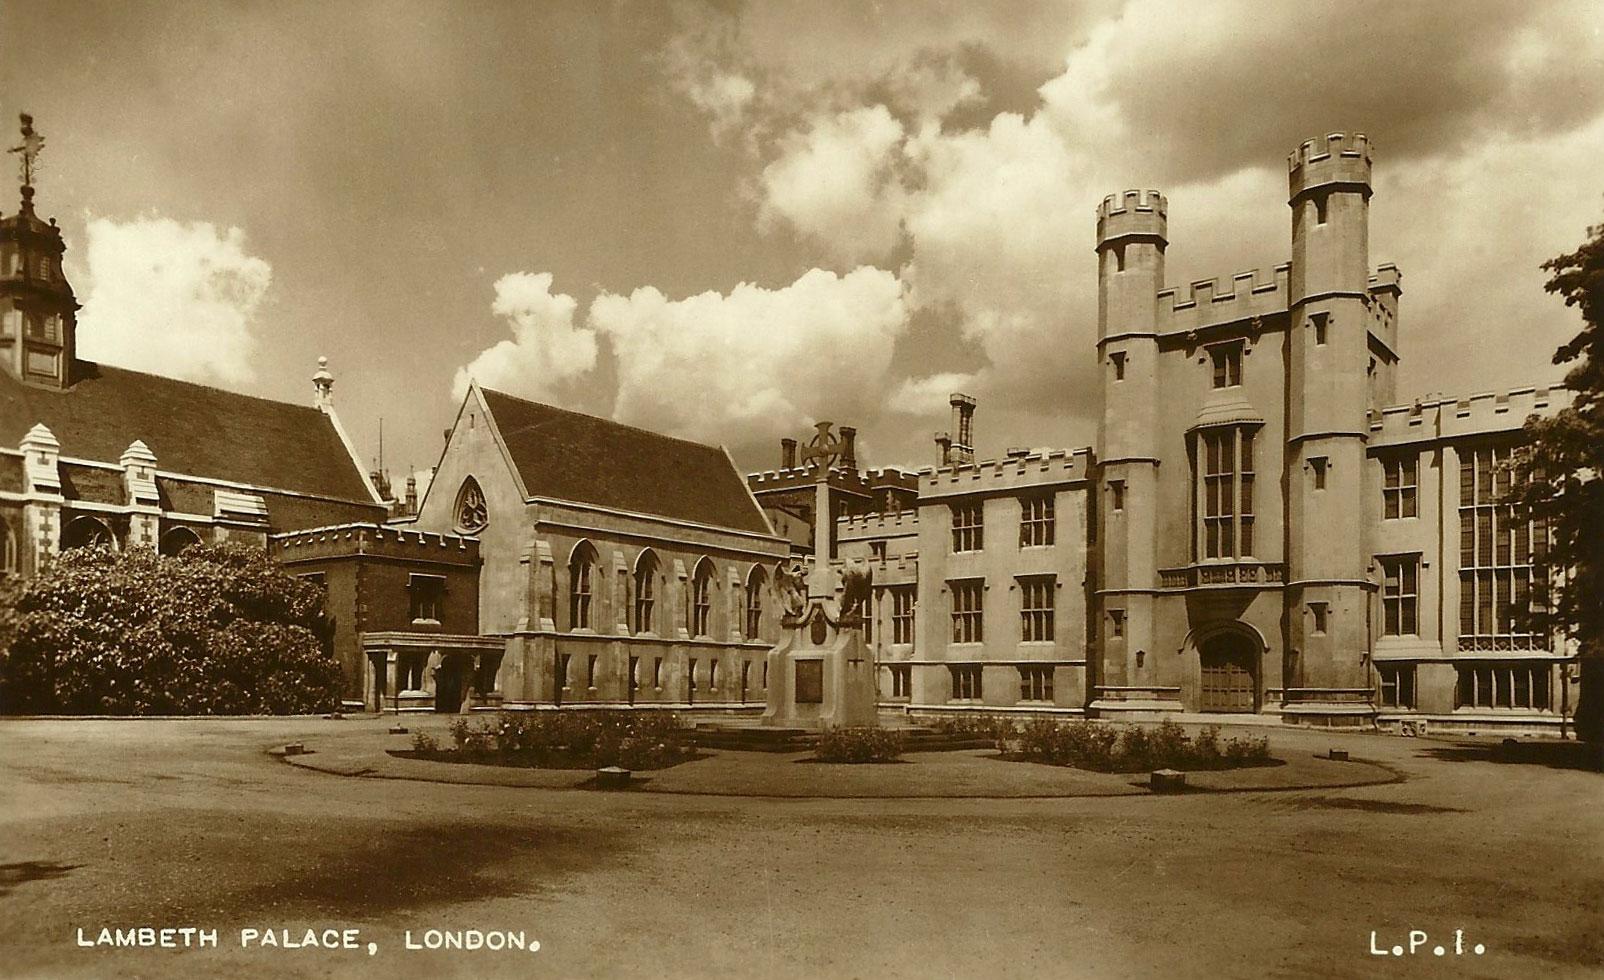 Lambeth Palace, England